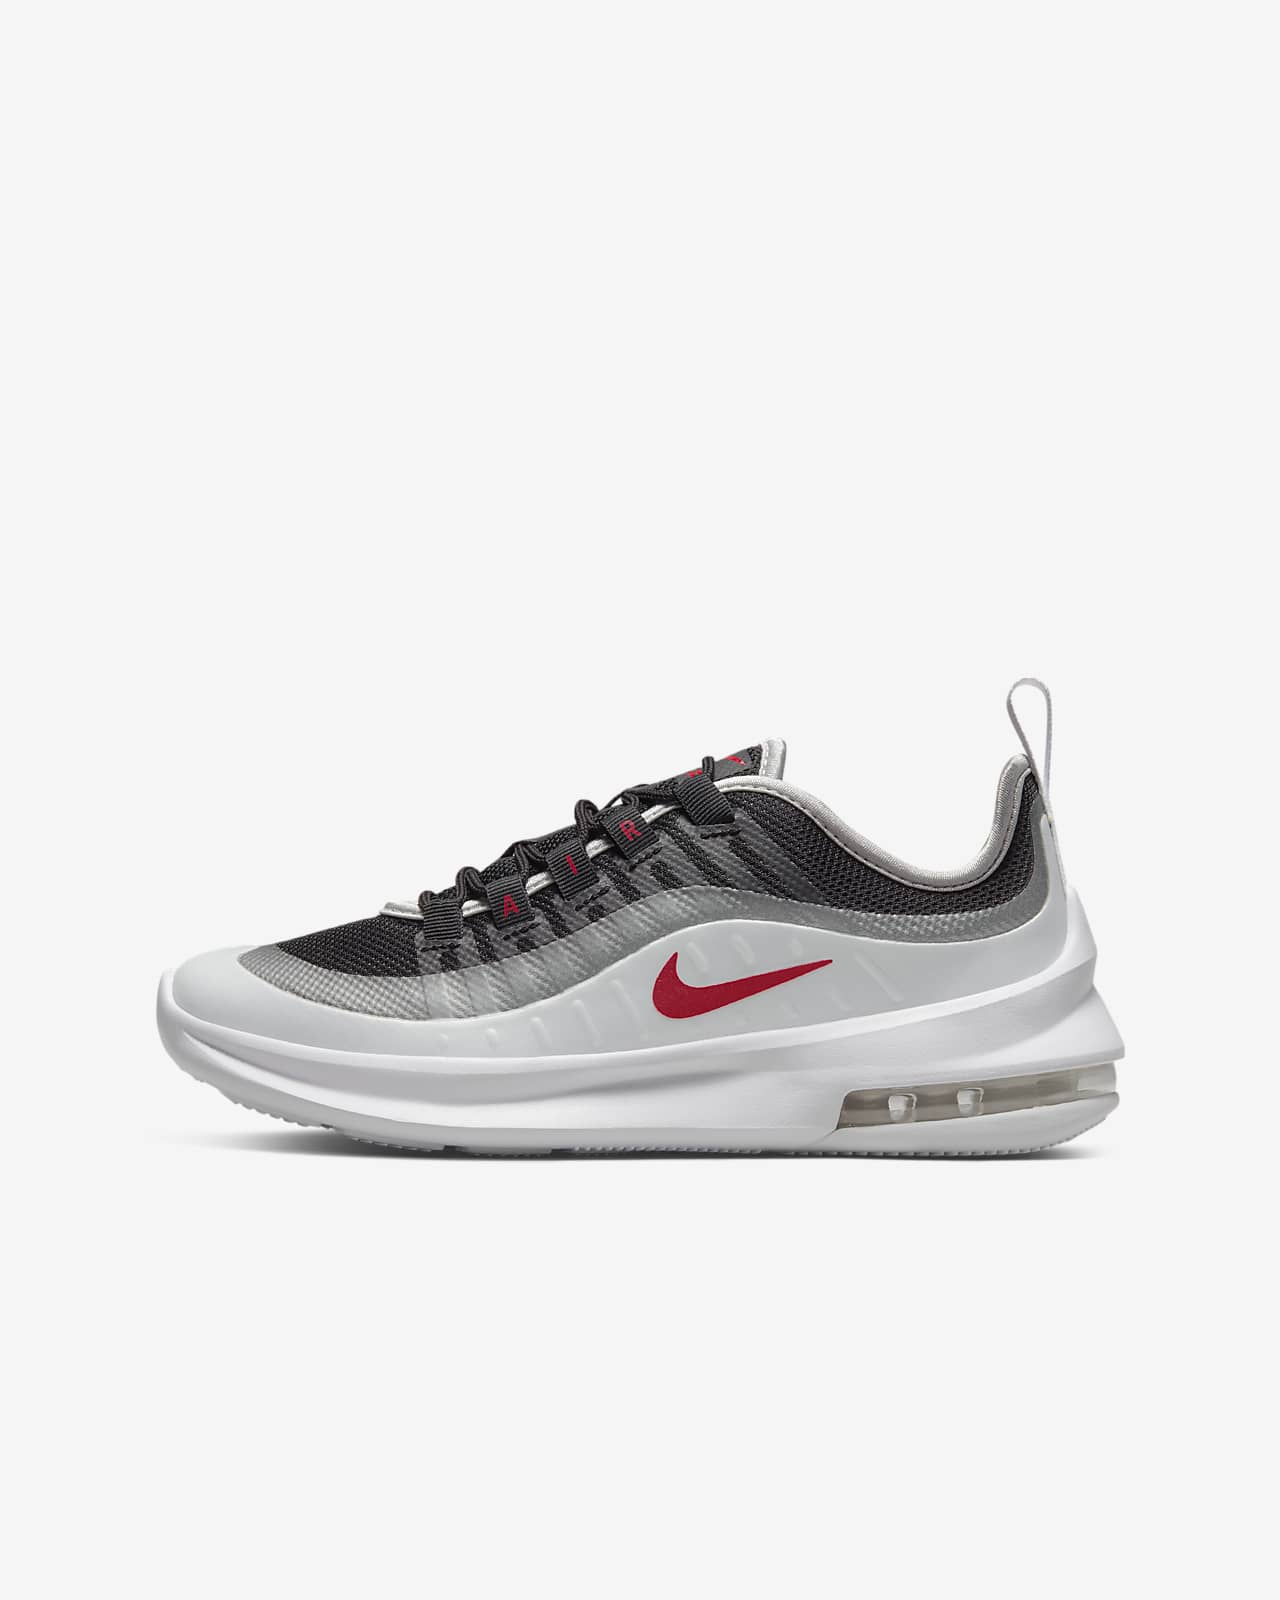 Nike Air Max Axis Big Kids' Shoe